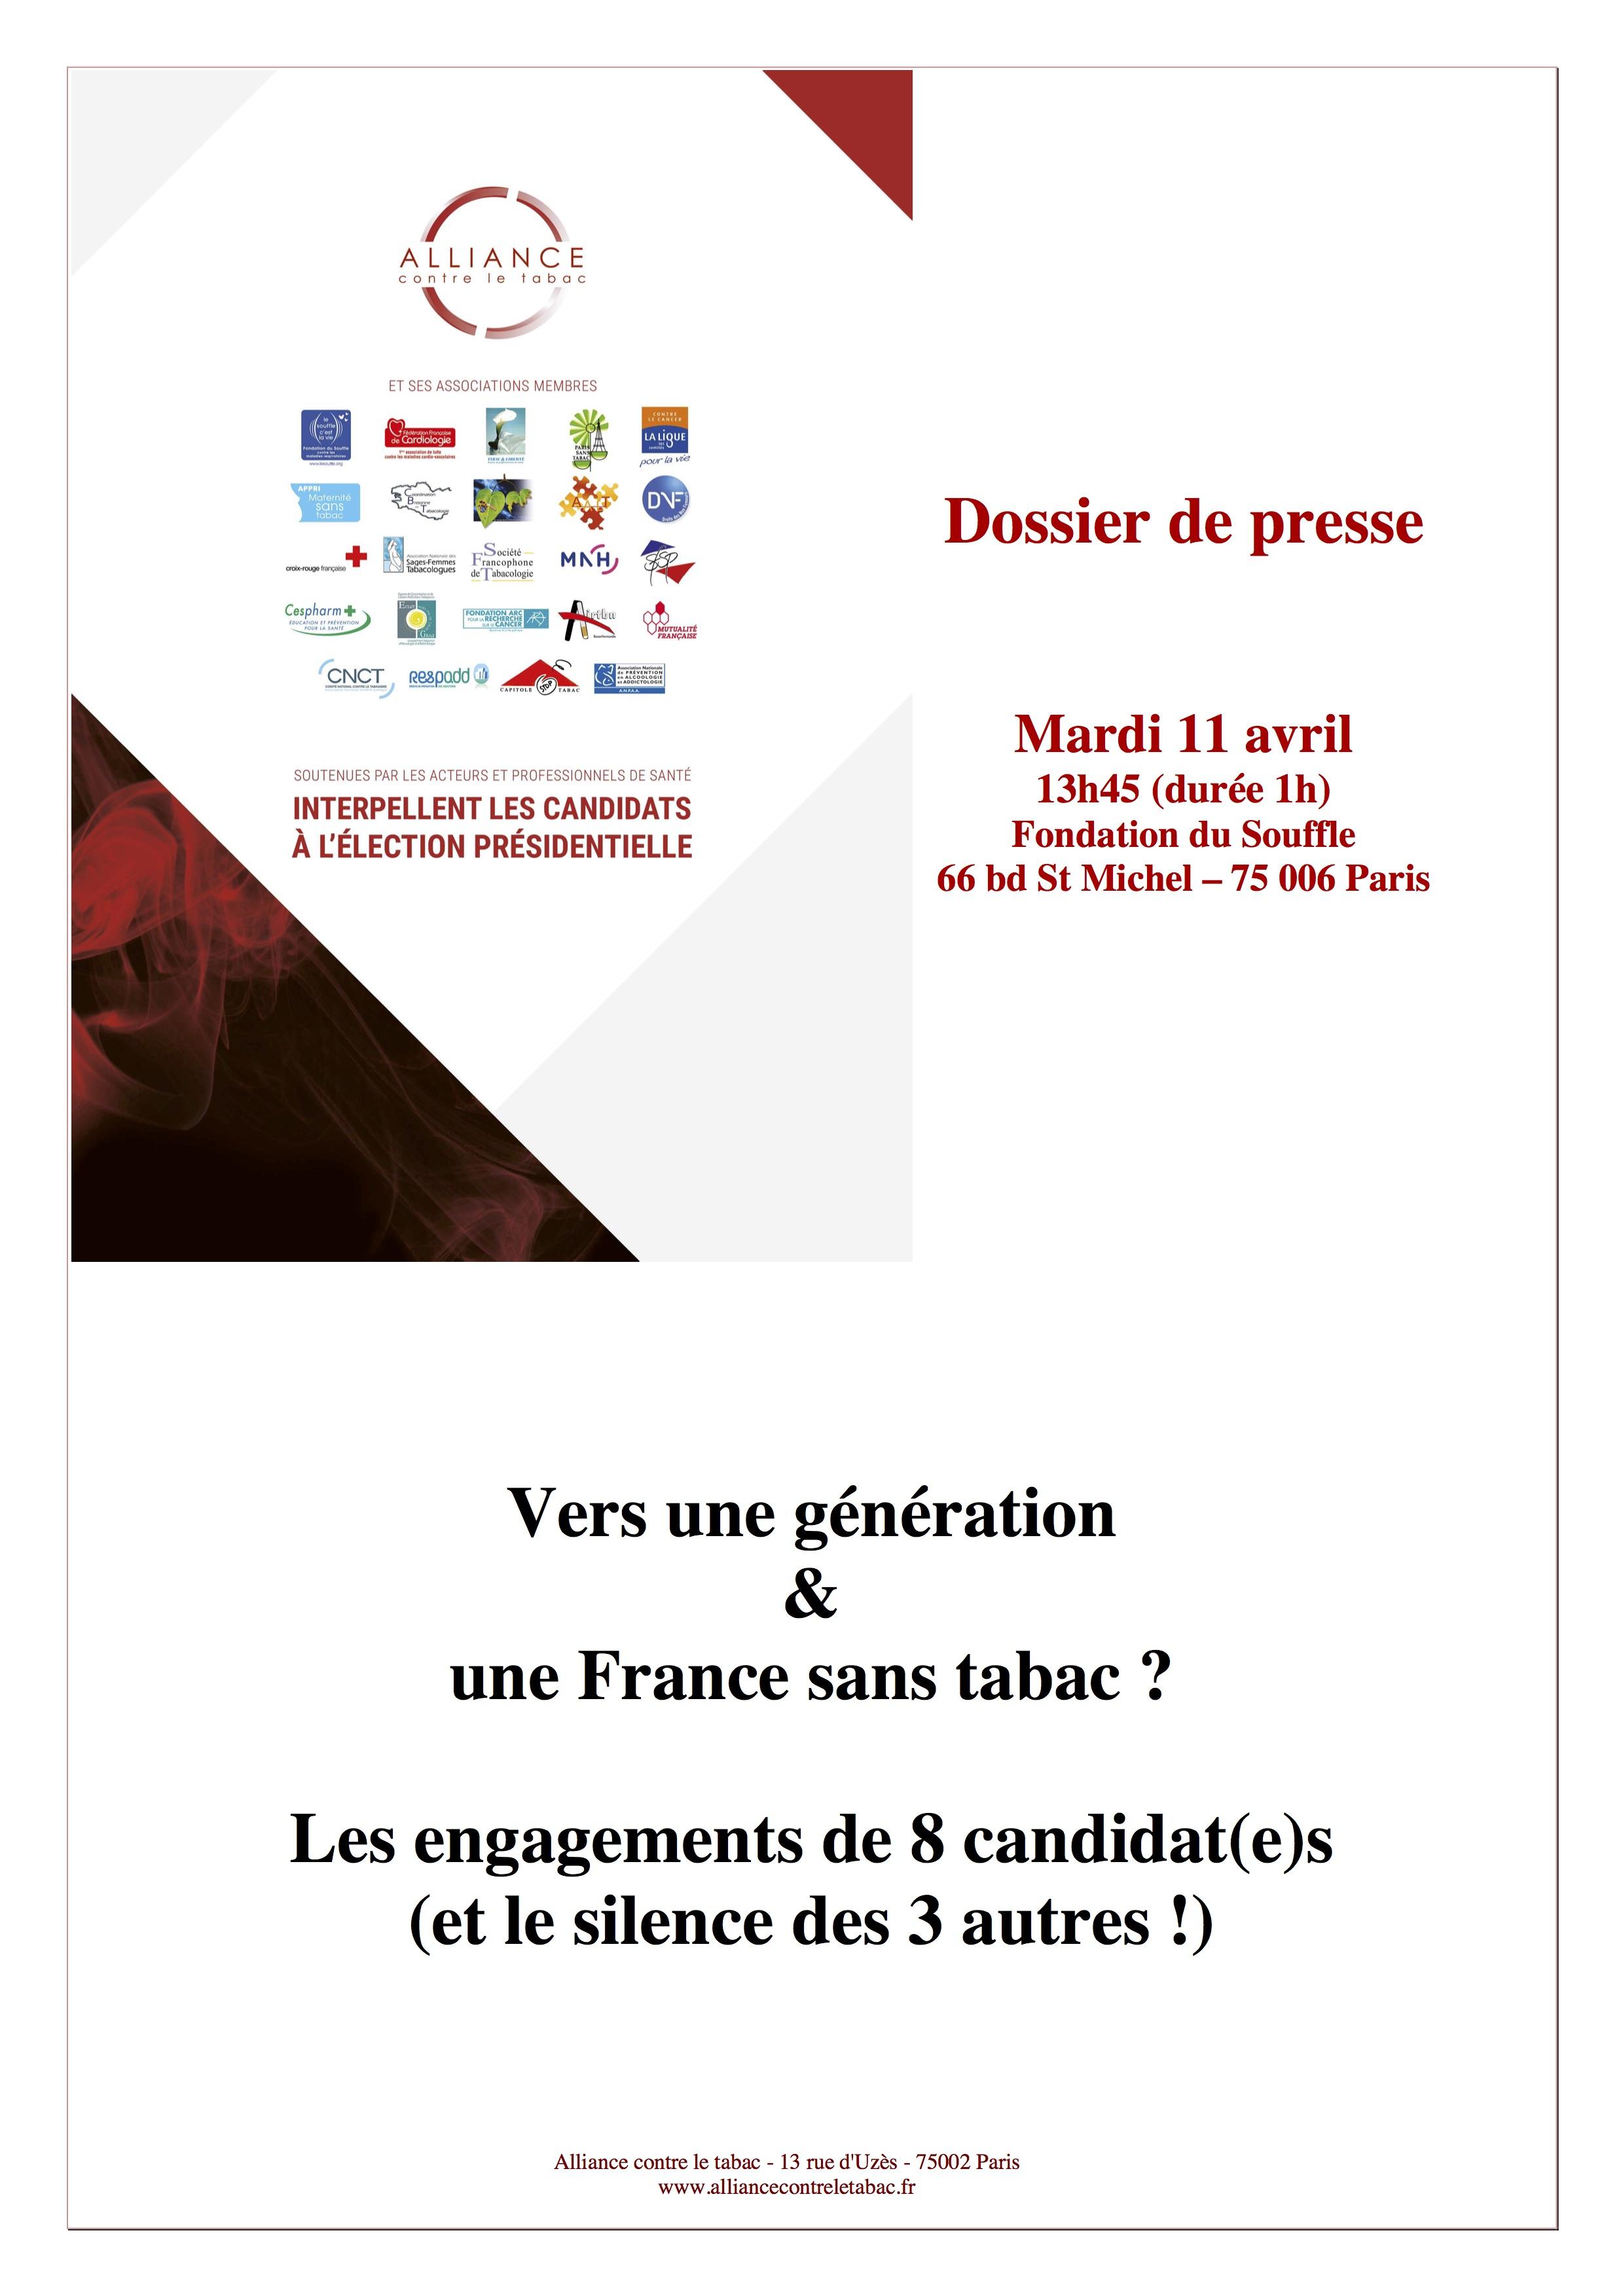 Alliance contre le tabac - DP - 11042017.jpg